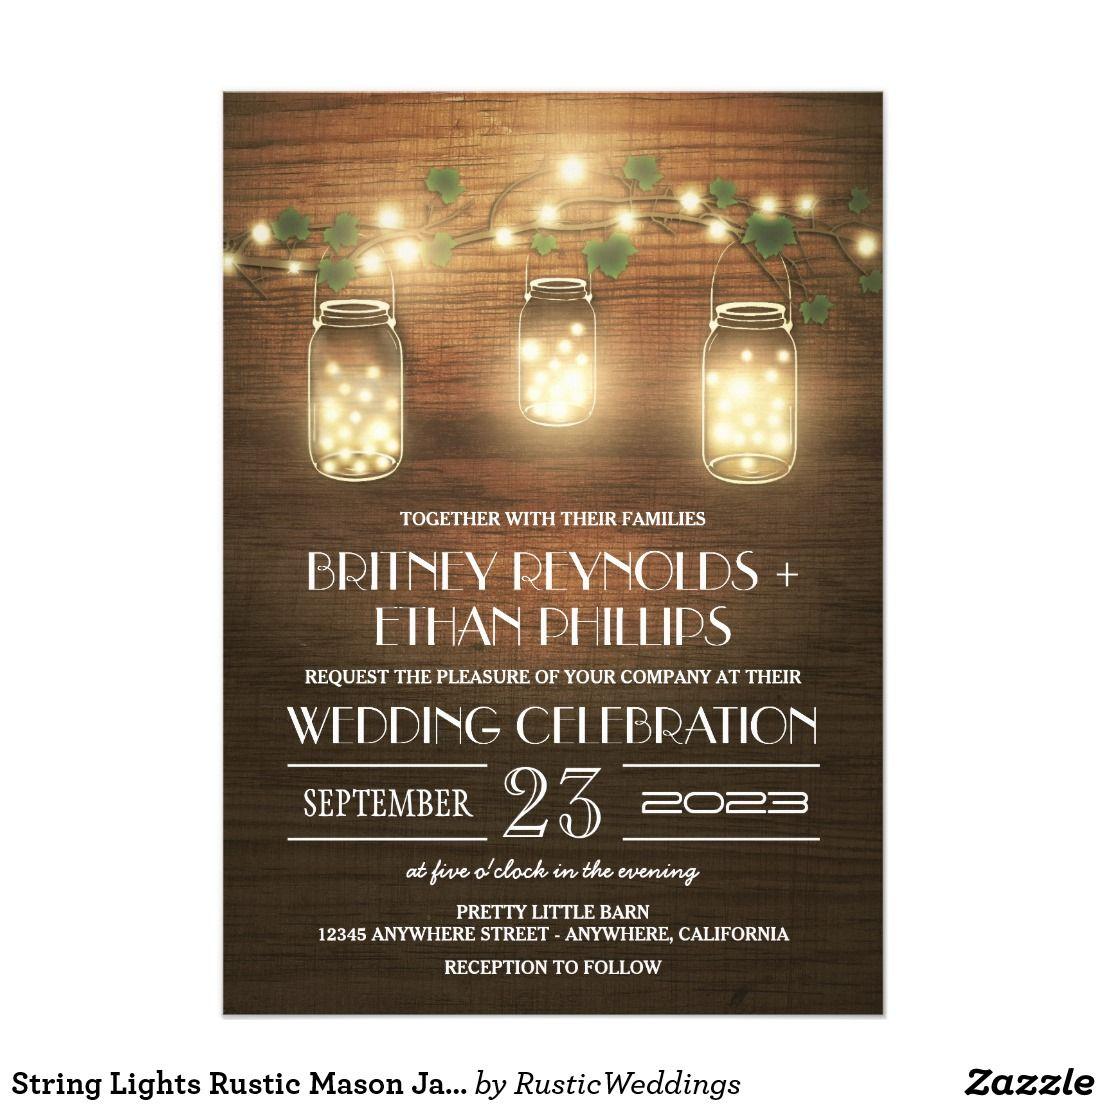 String Lights Rustic Mason Jar Wedding Invitations